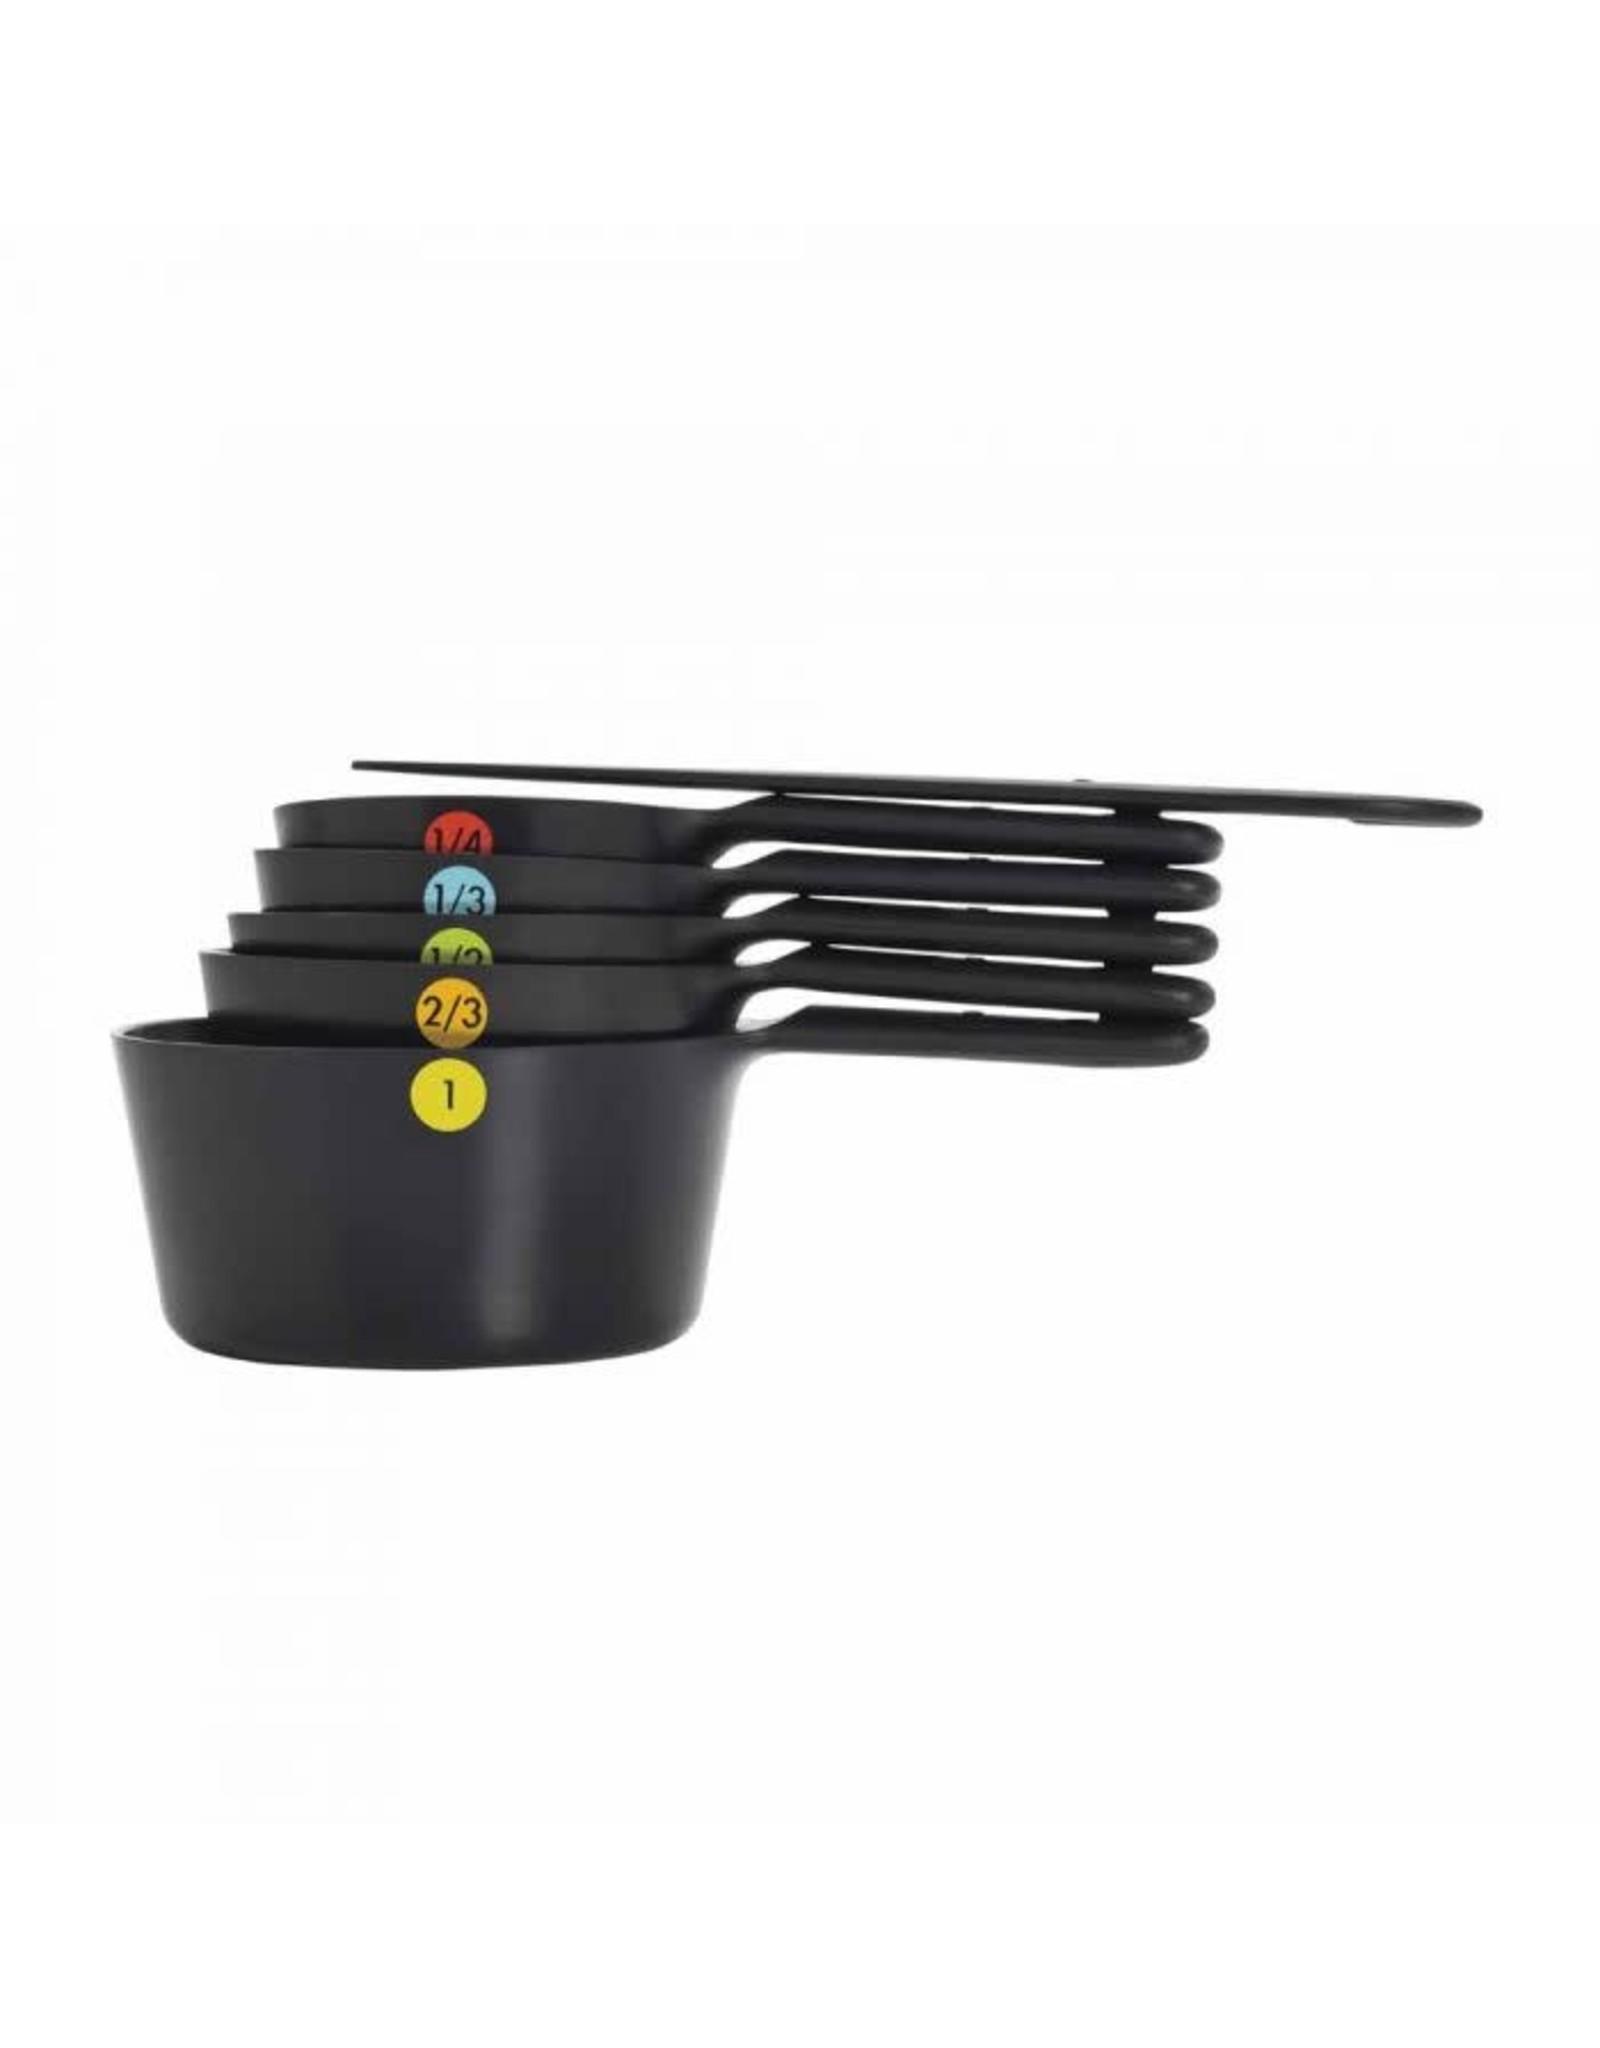 Oxo Snap Measuring Cup Set, Black, 6 Pc.